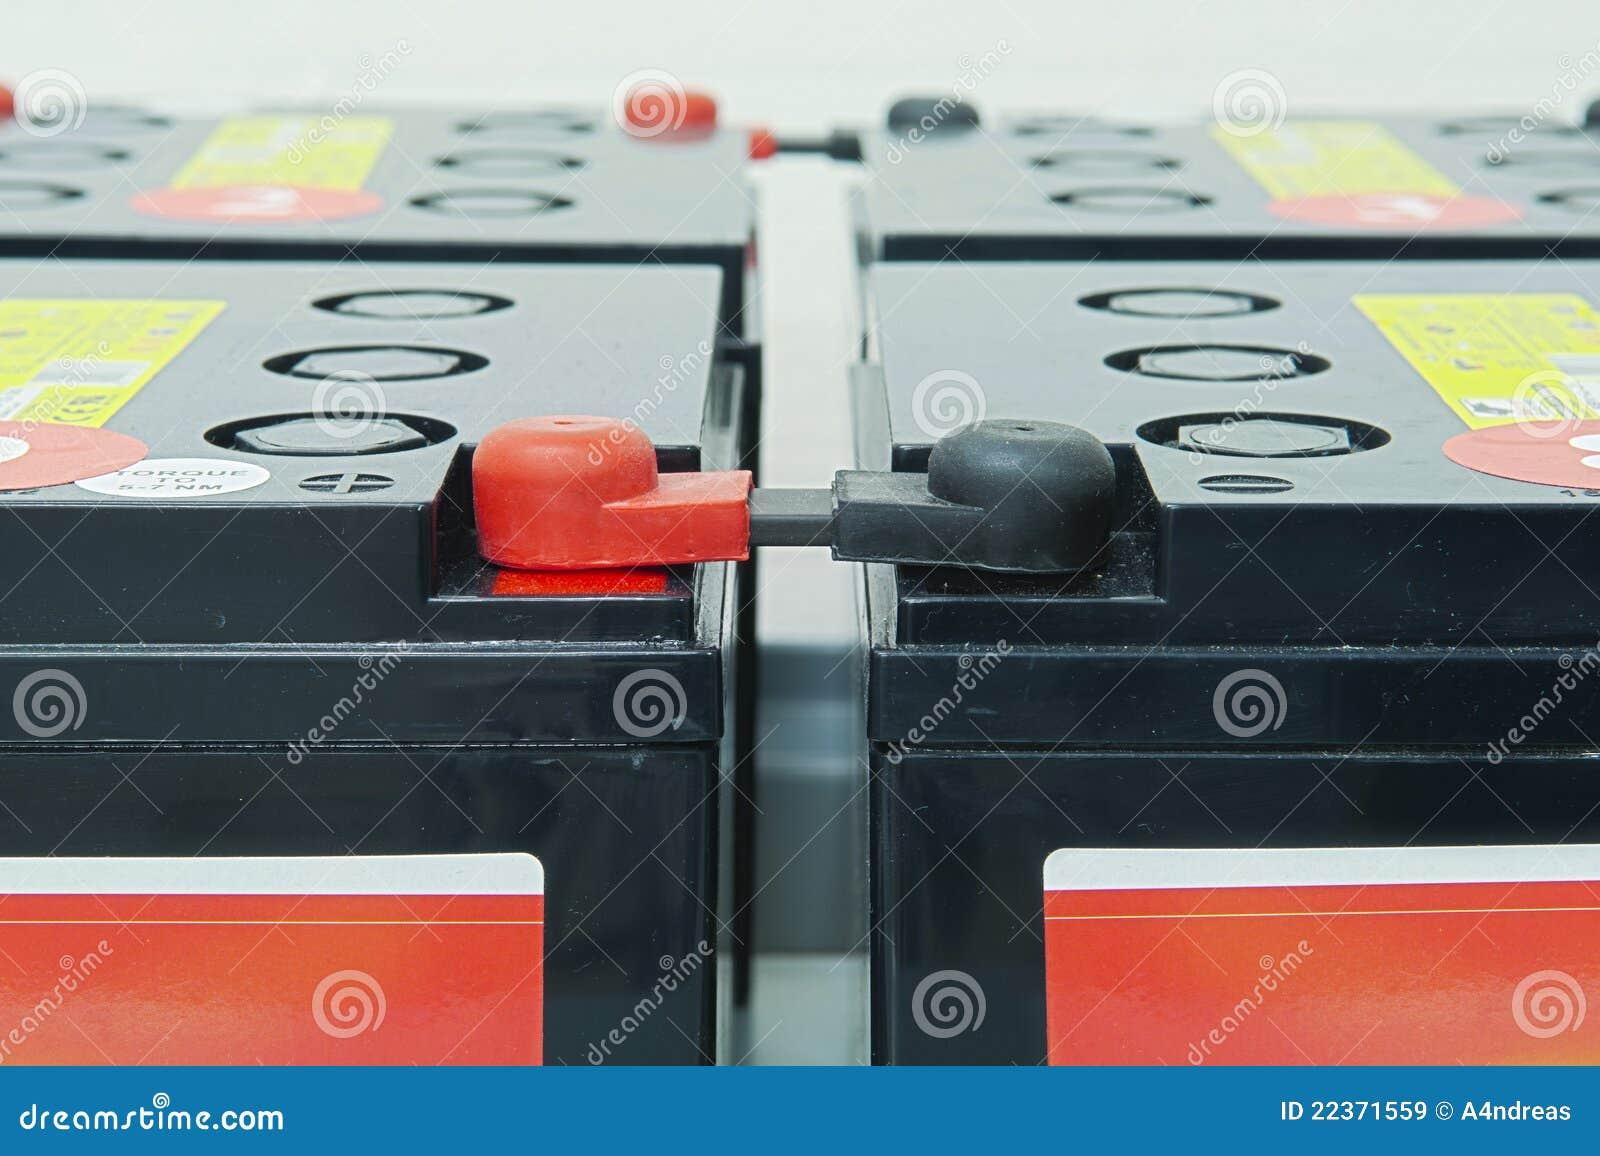 Emergency batteries for an uninterrupted power